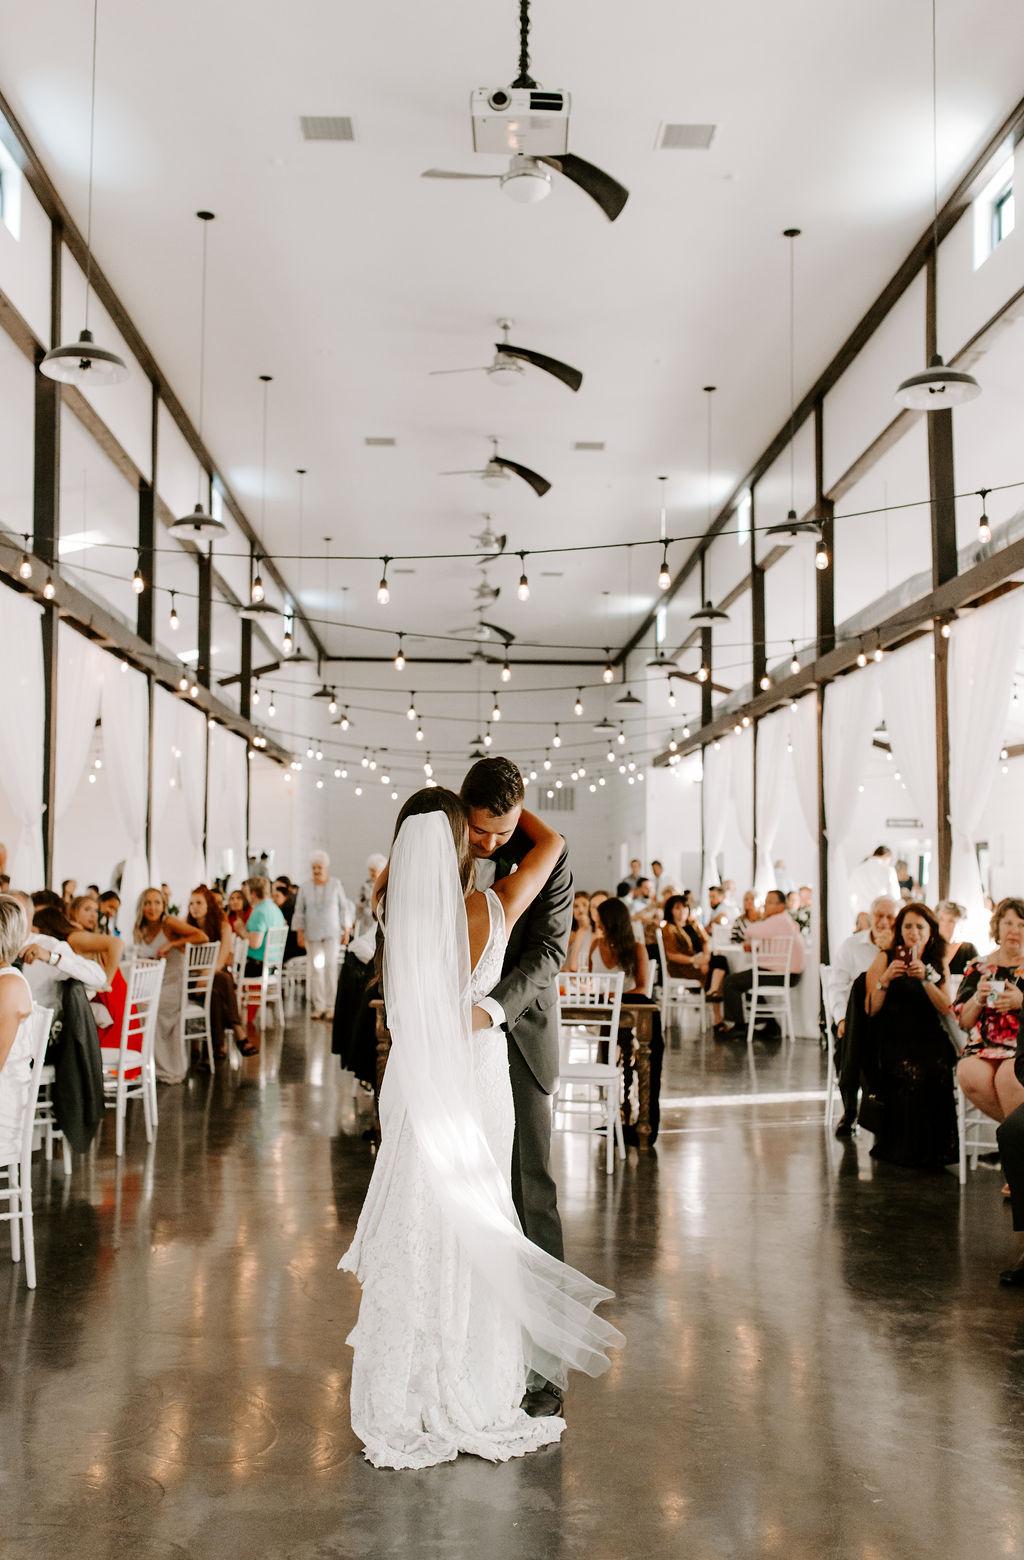 Tulsa White Barn Wedding Venue Outdoor Ceremony 106.jpg